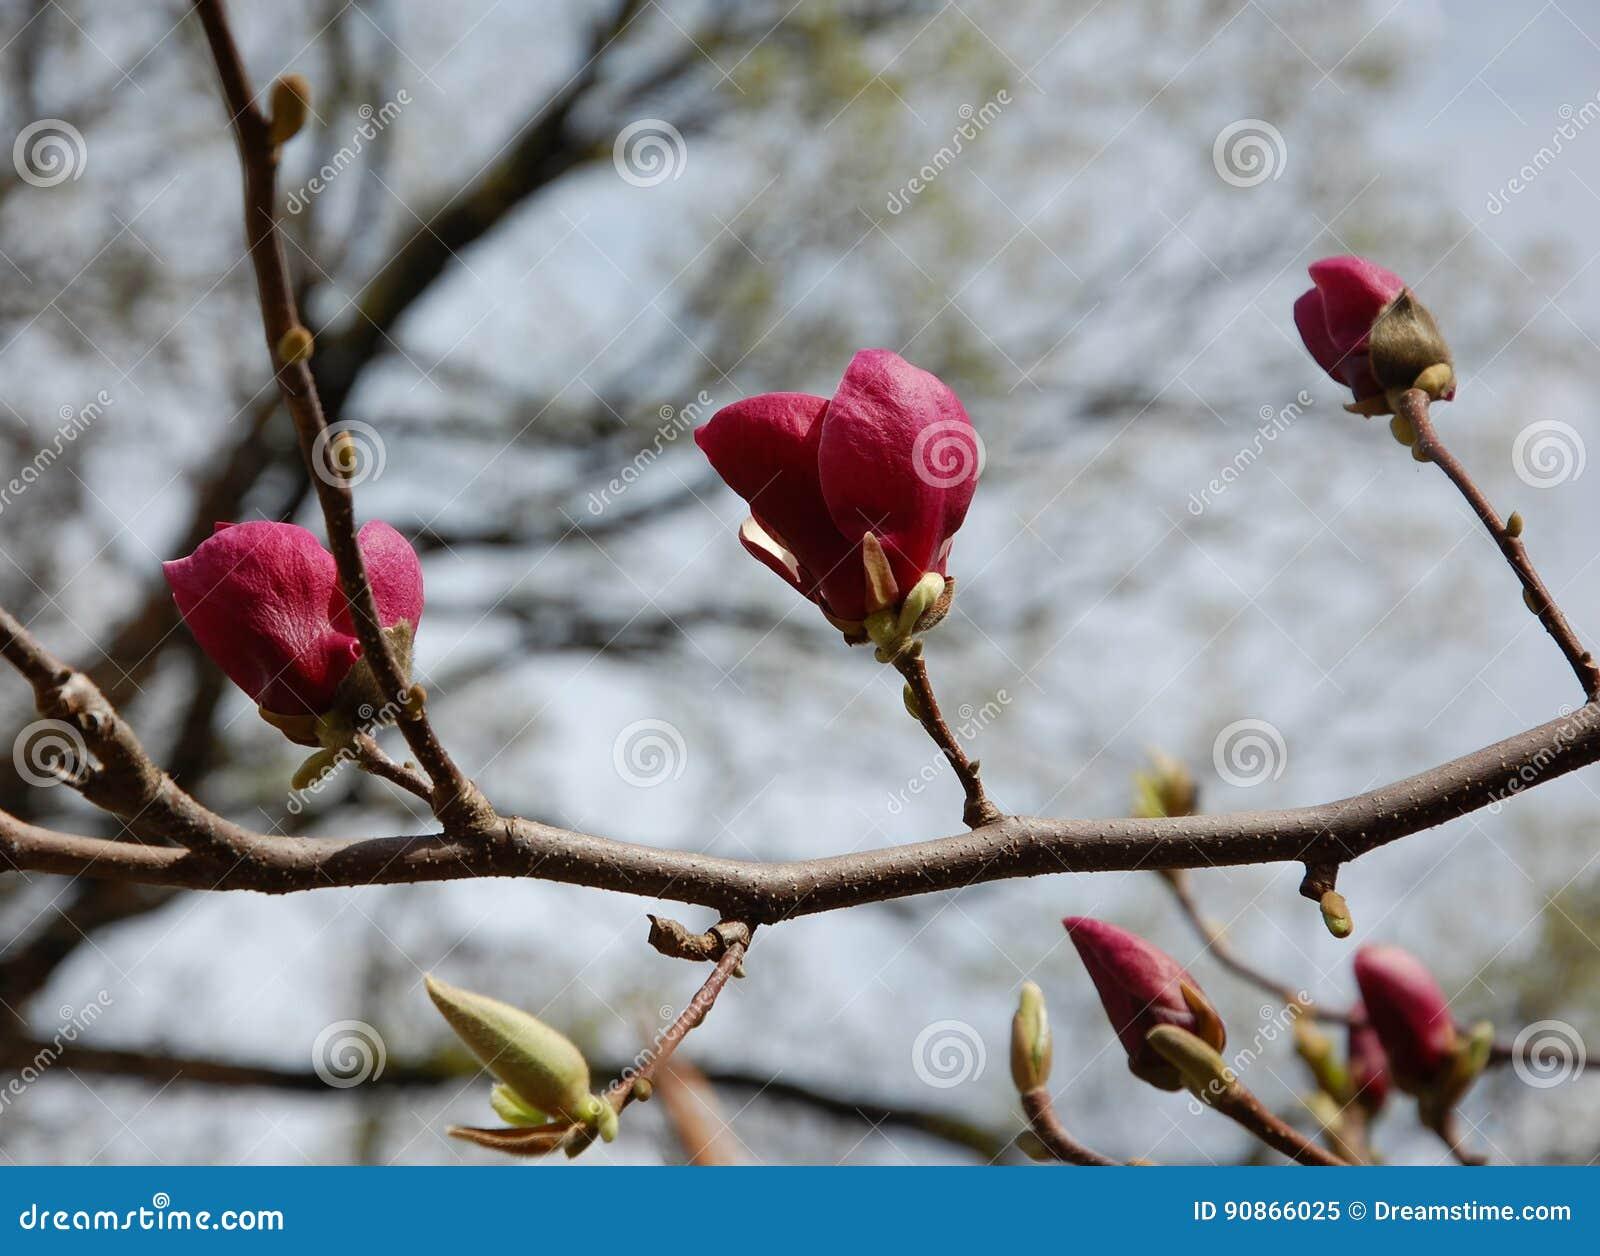 Beautiful dark pink magnolia flowers on a branch of a blossoming download beautiful dark pink magnolia flowers on a branch of a blossoming tree stock image mightylinksfo